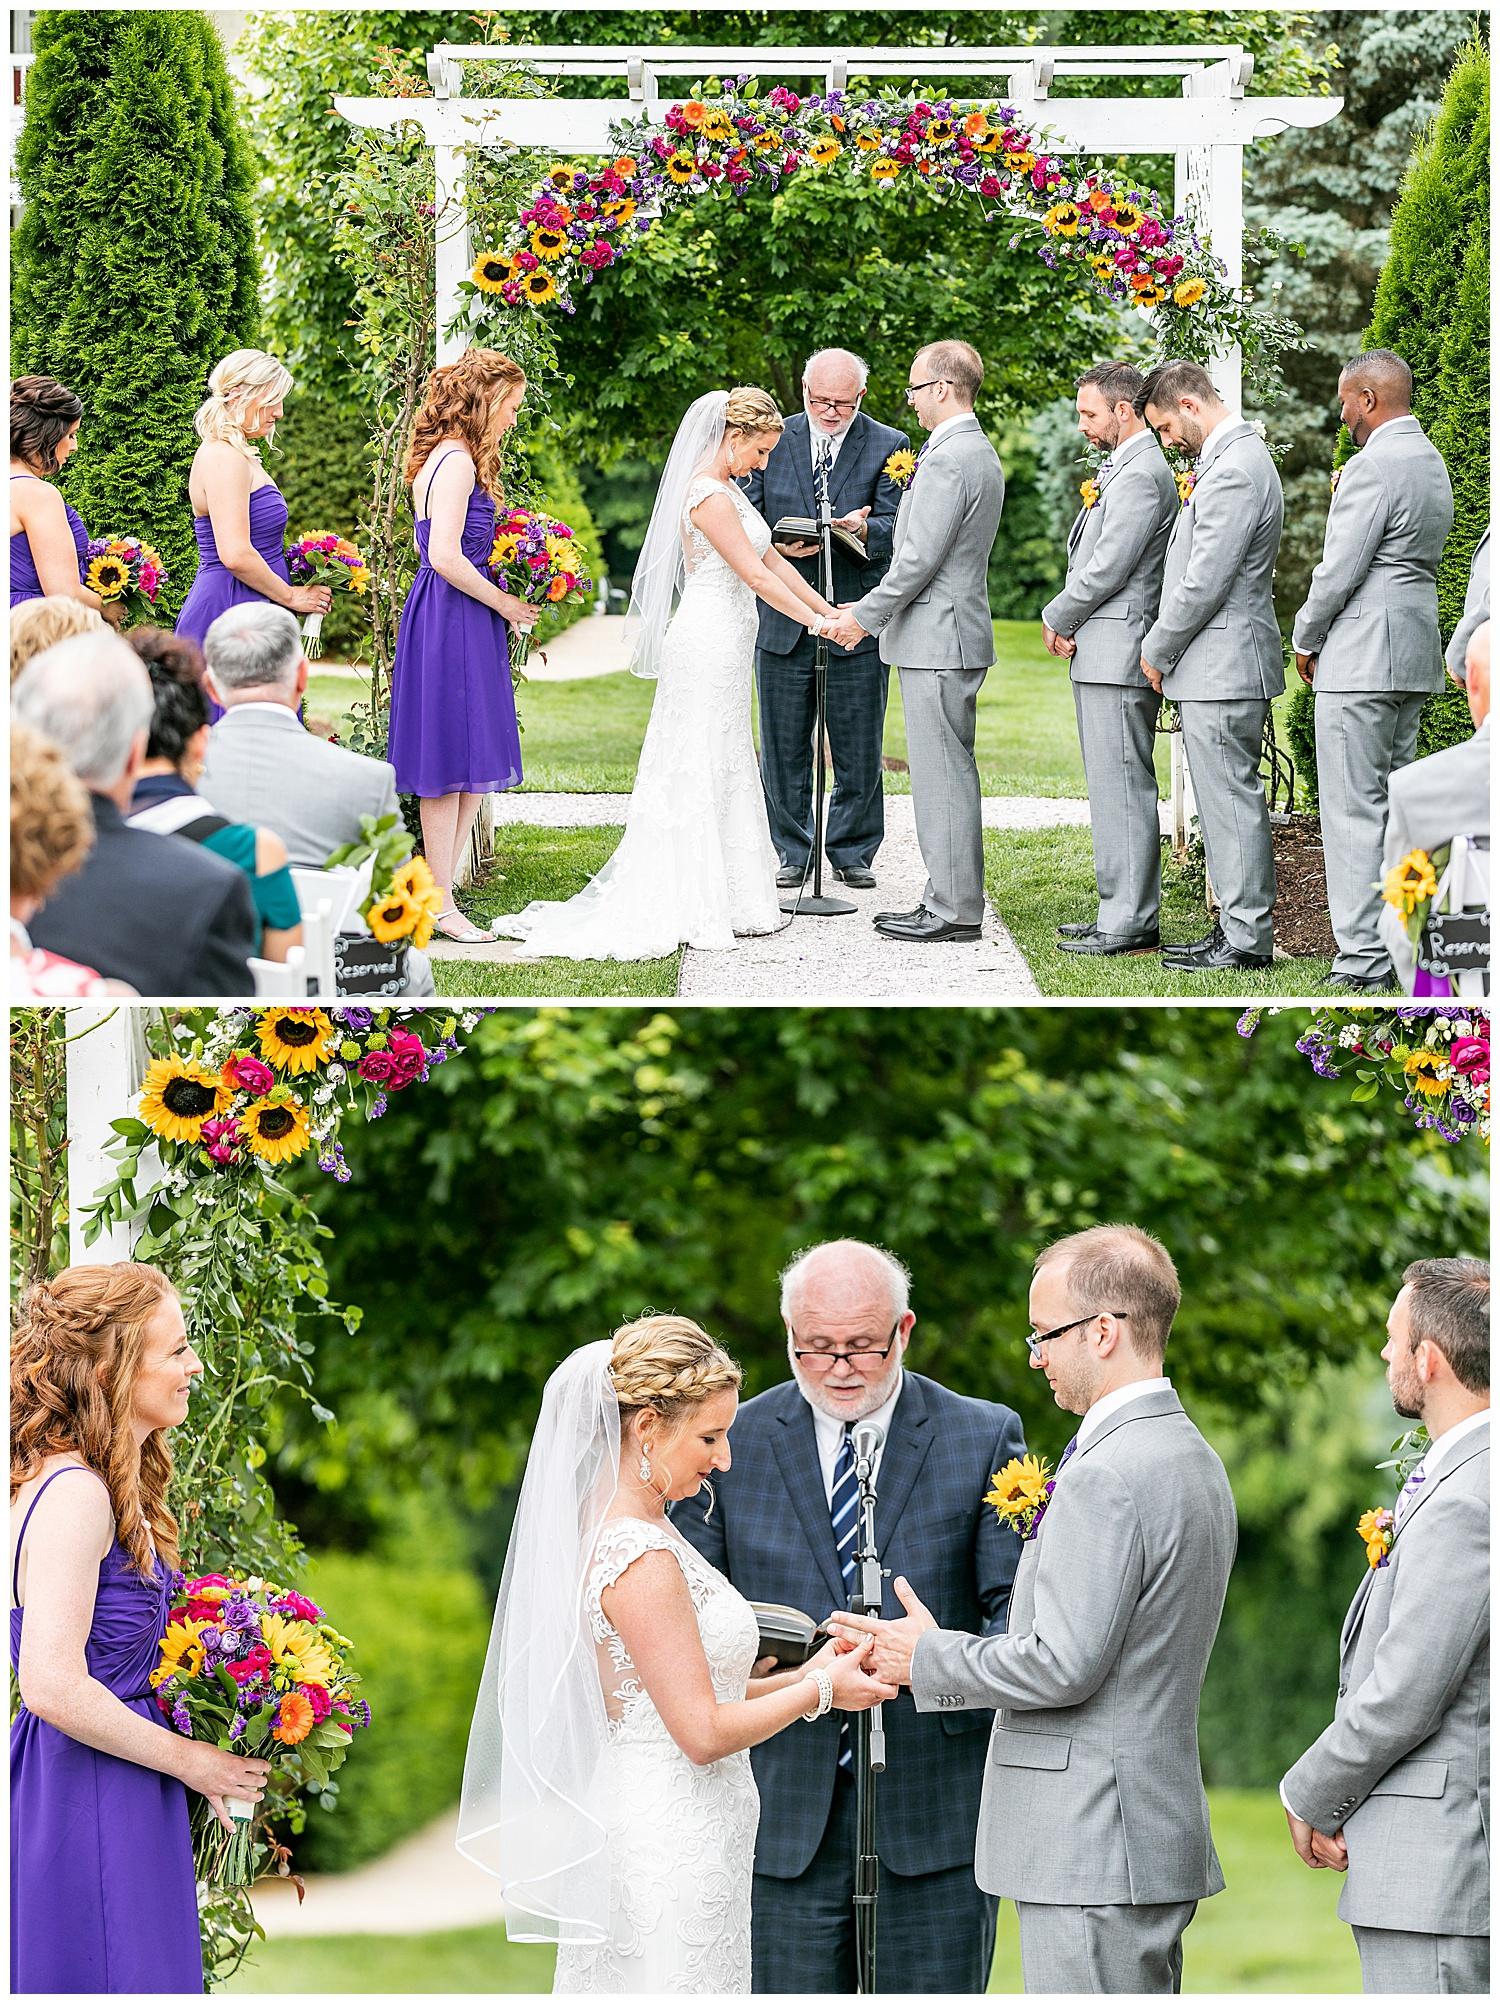 Michelle Shaun Antrim 1844 Wedding Living Radiant Photography photos_0134.jpg